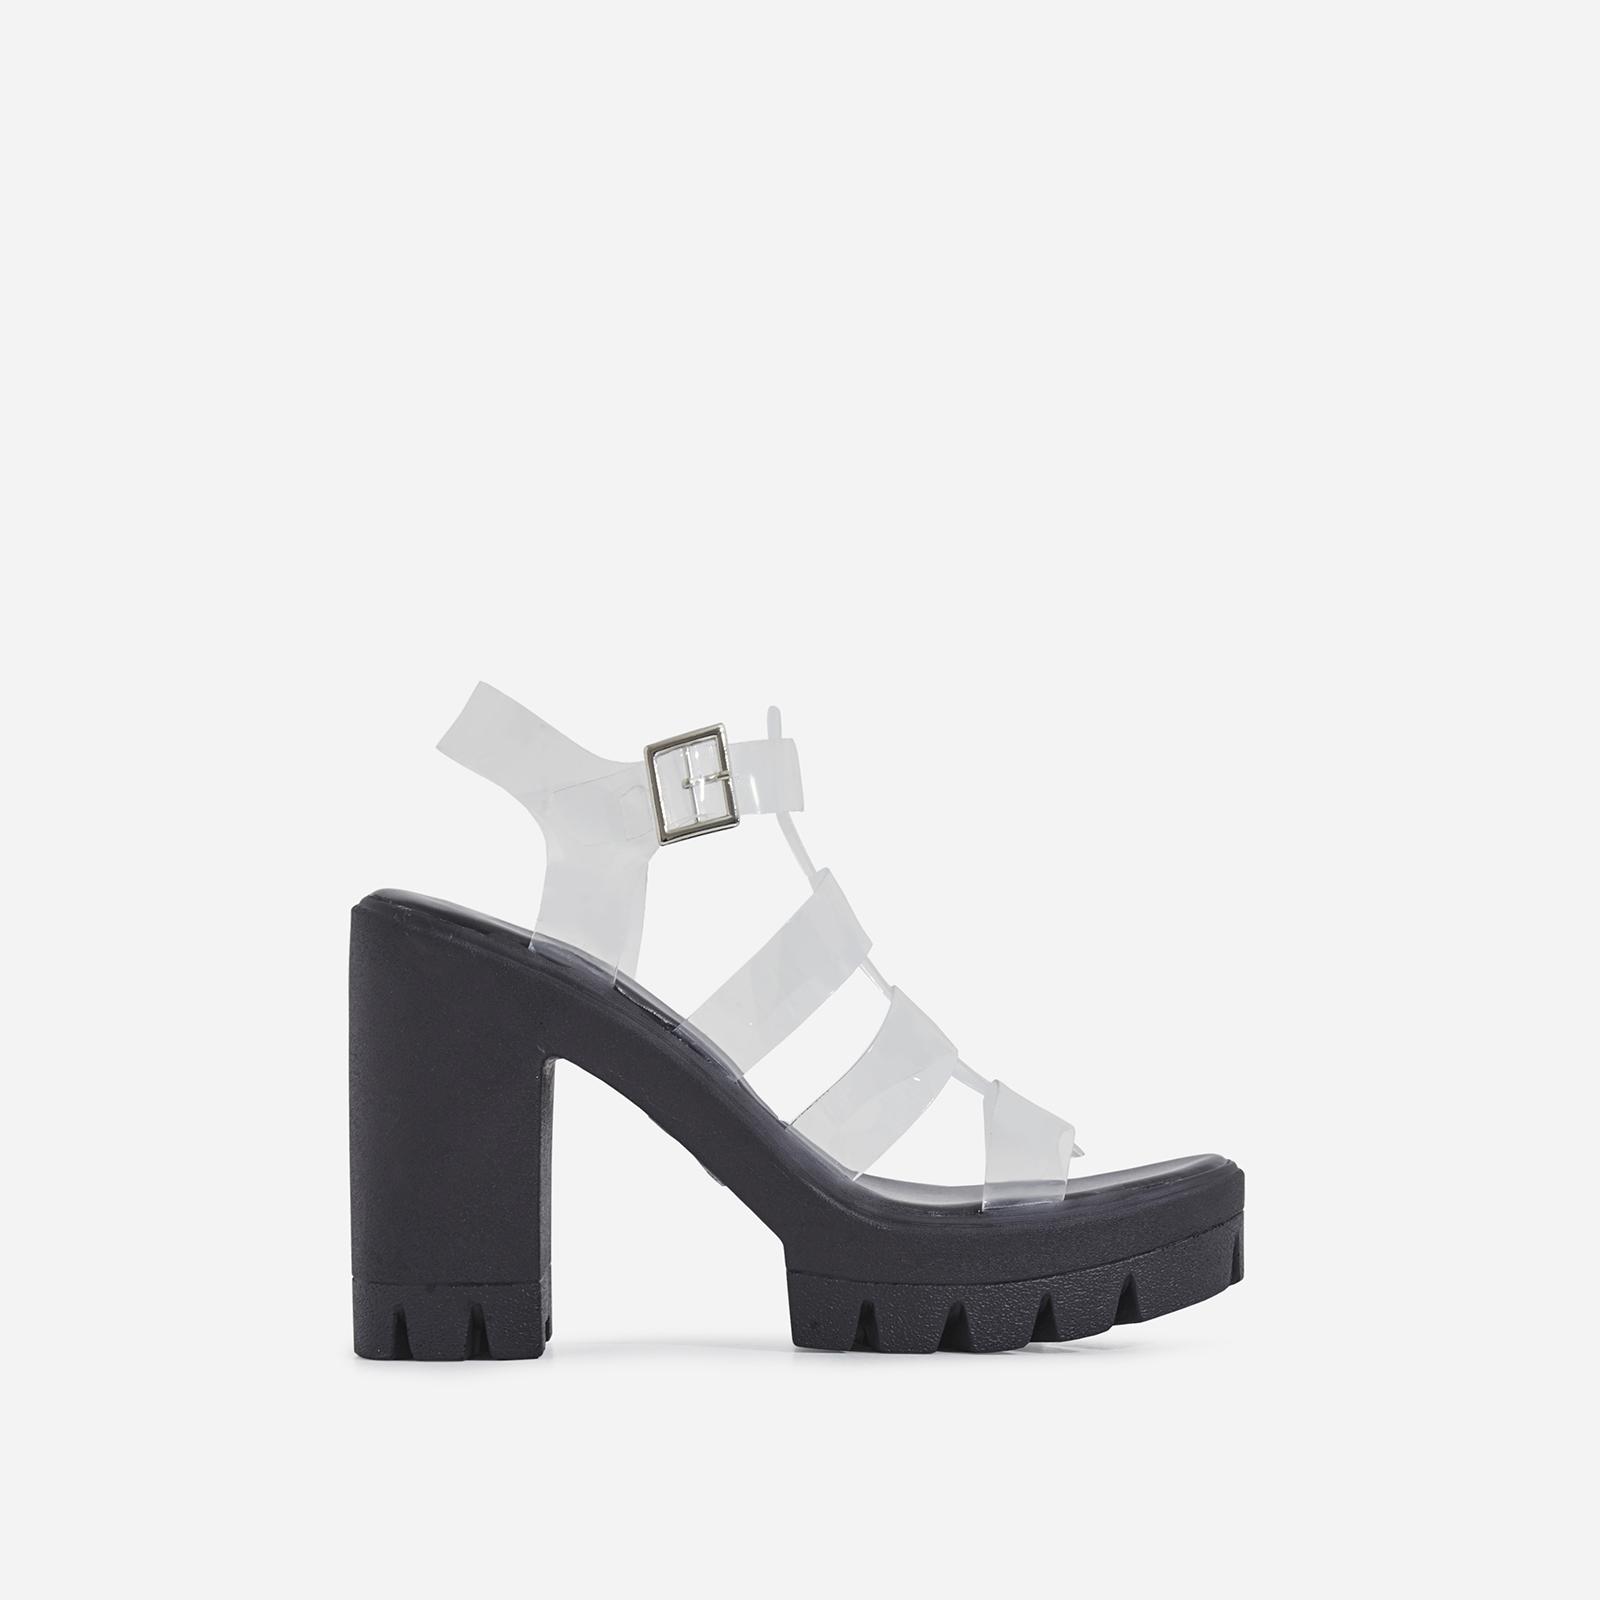 Heels | High Heels, Stilettos \u0026 Perspex